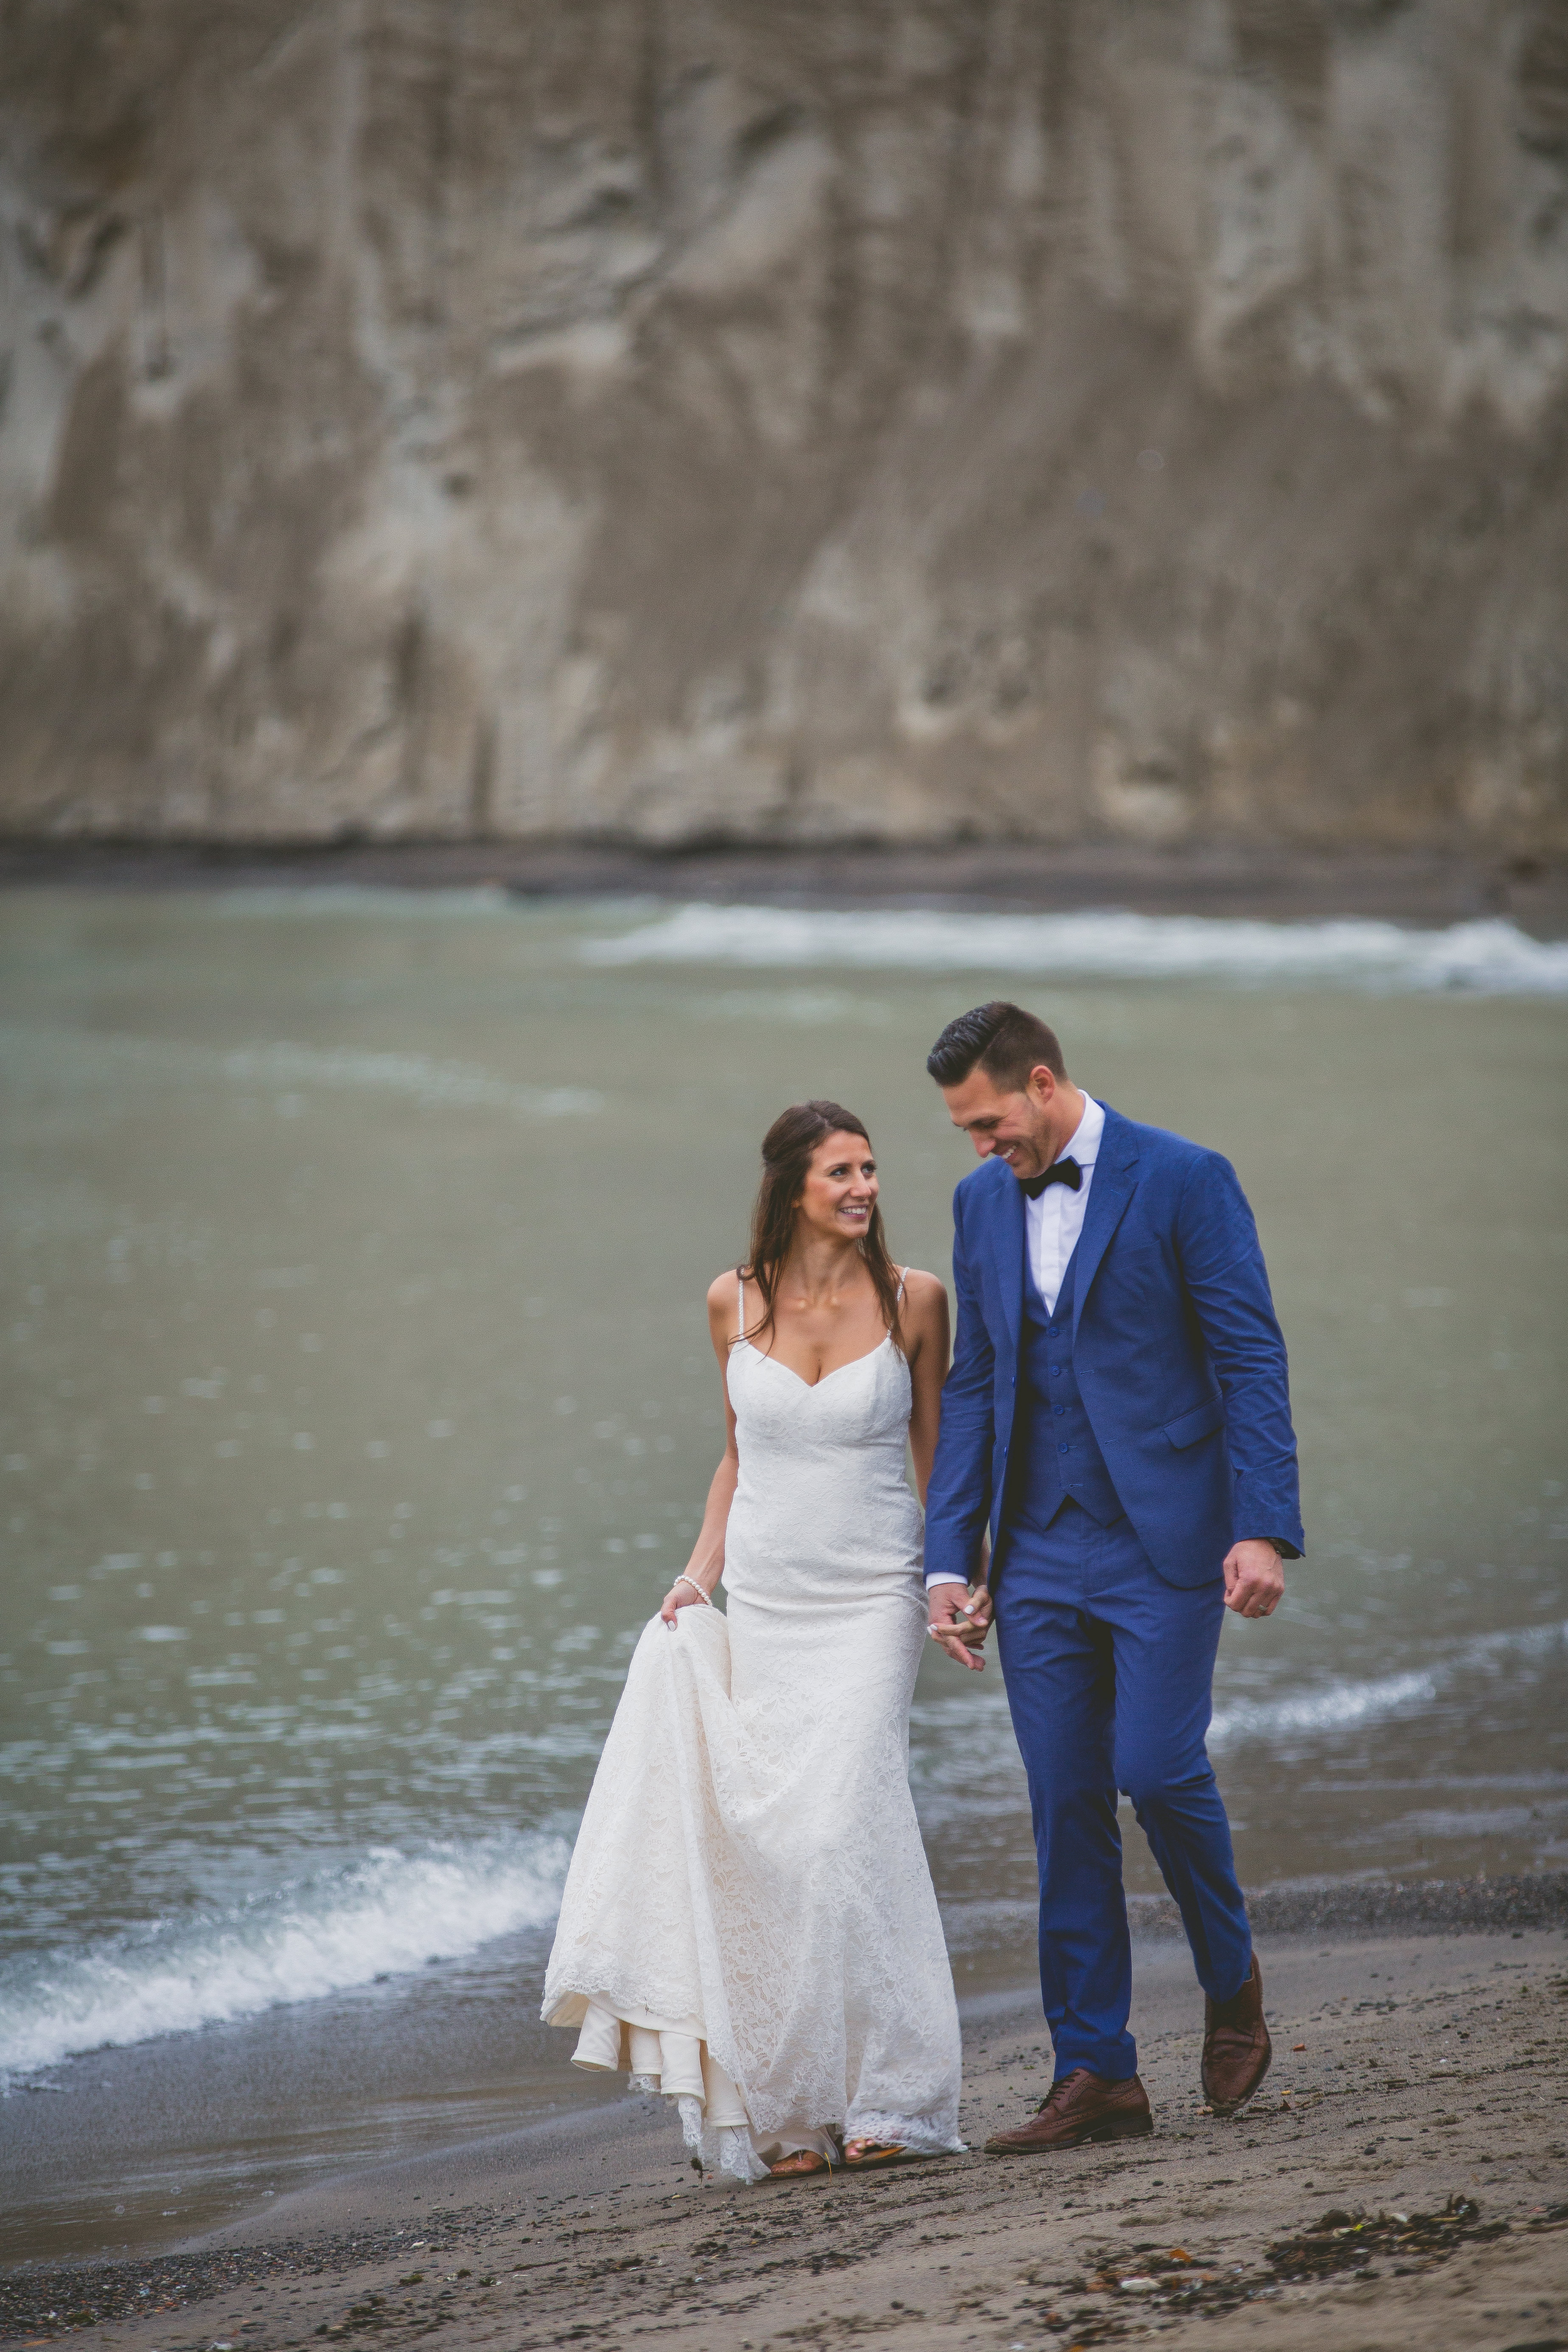 scarborough bluffs wedding photos 67 - Scarborough Bluffs Wedding Photos